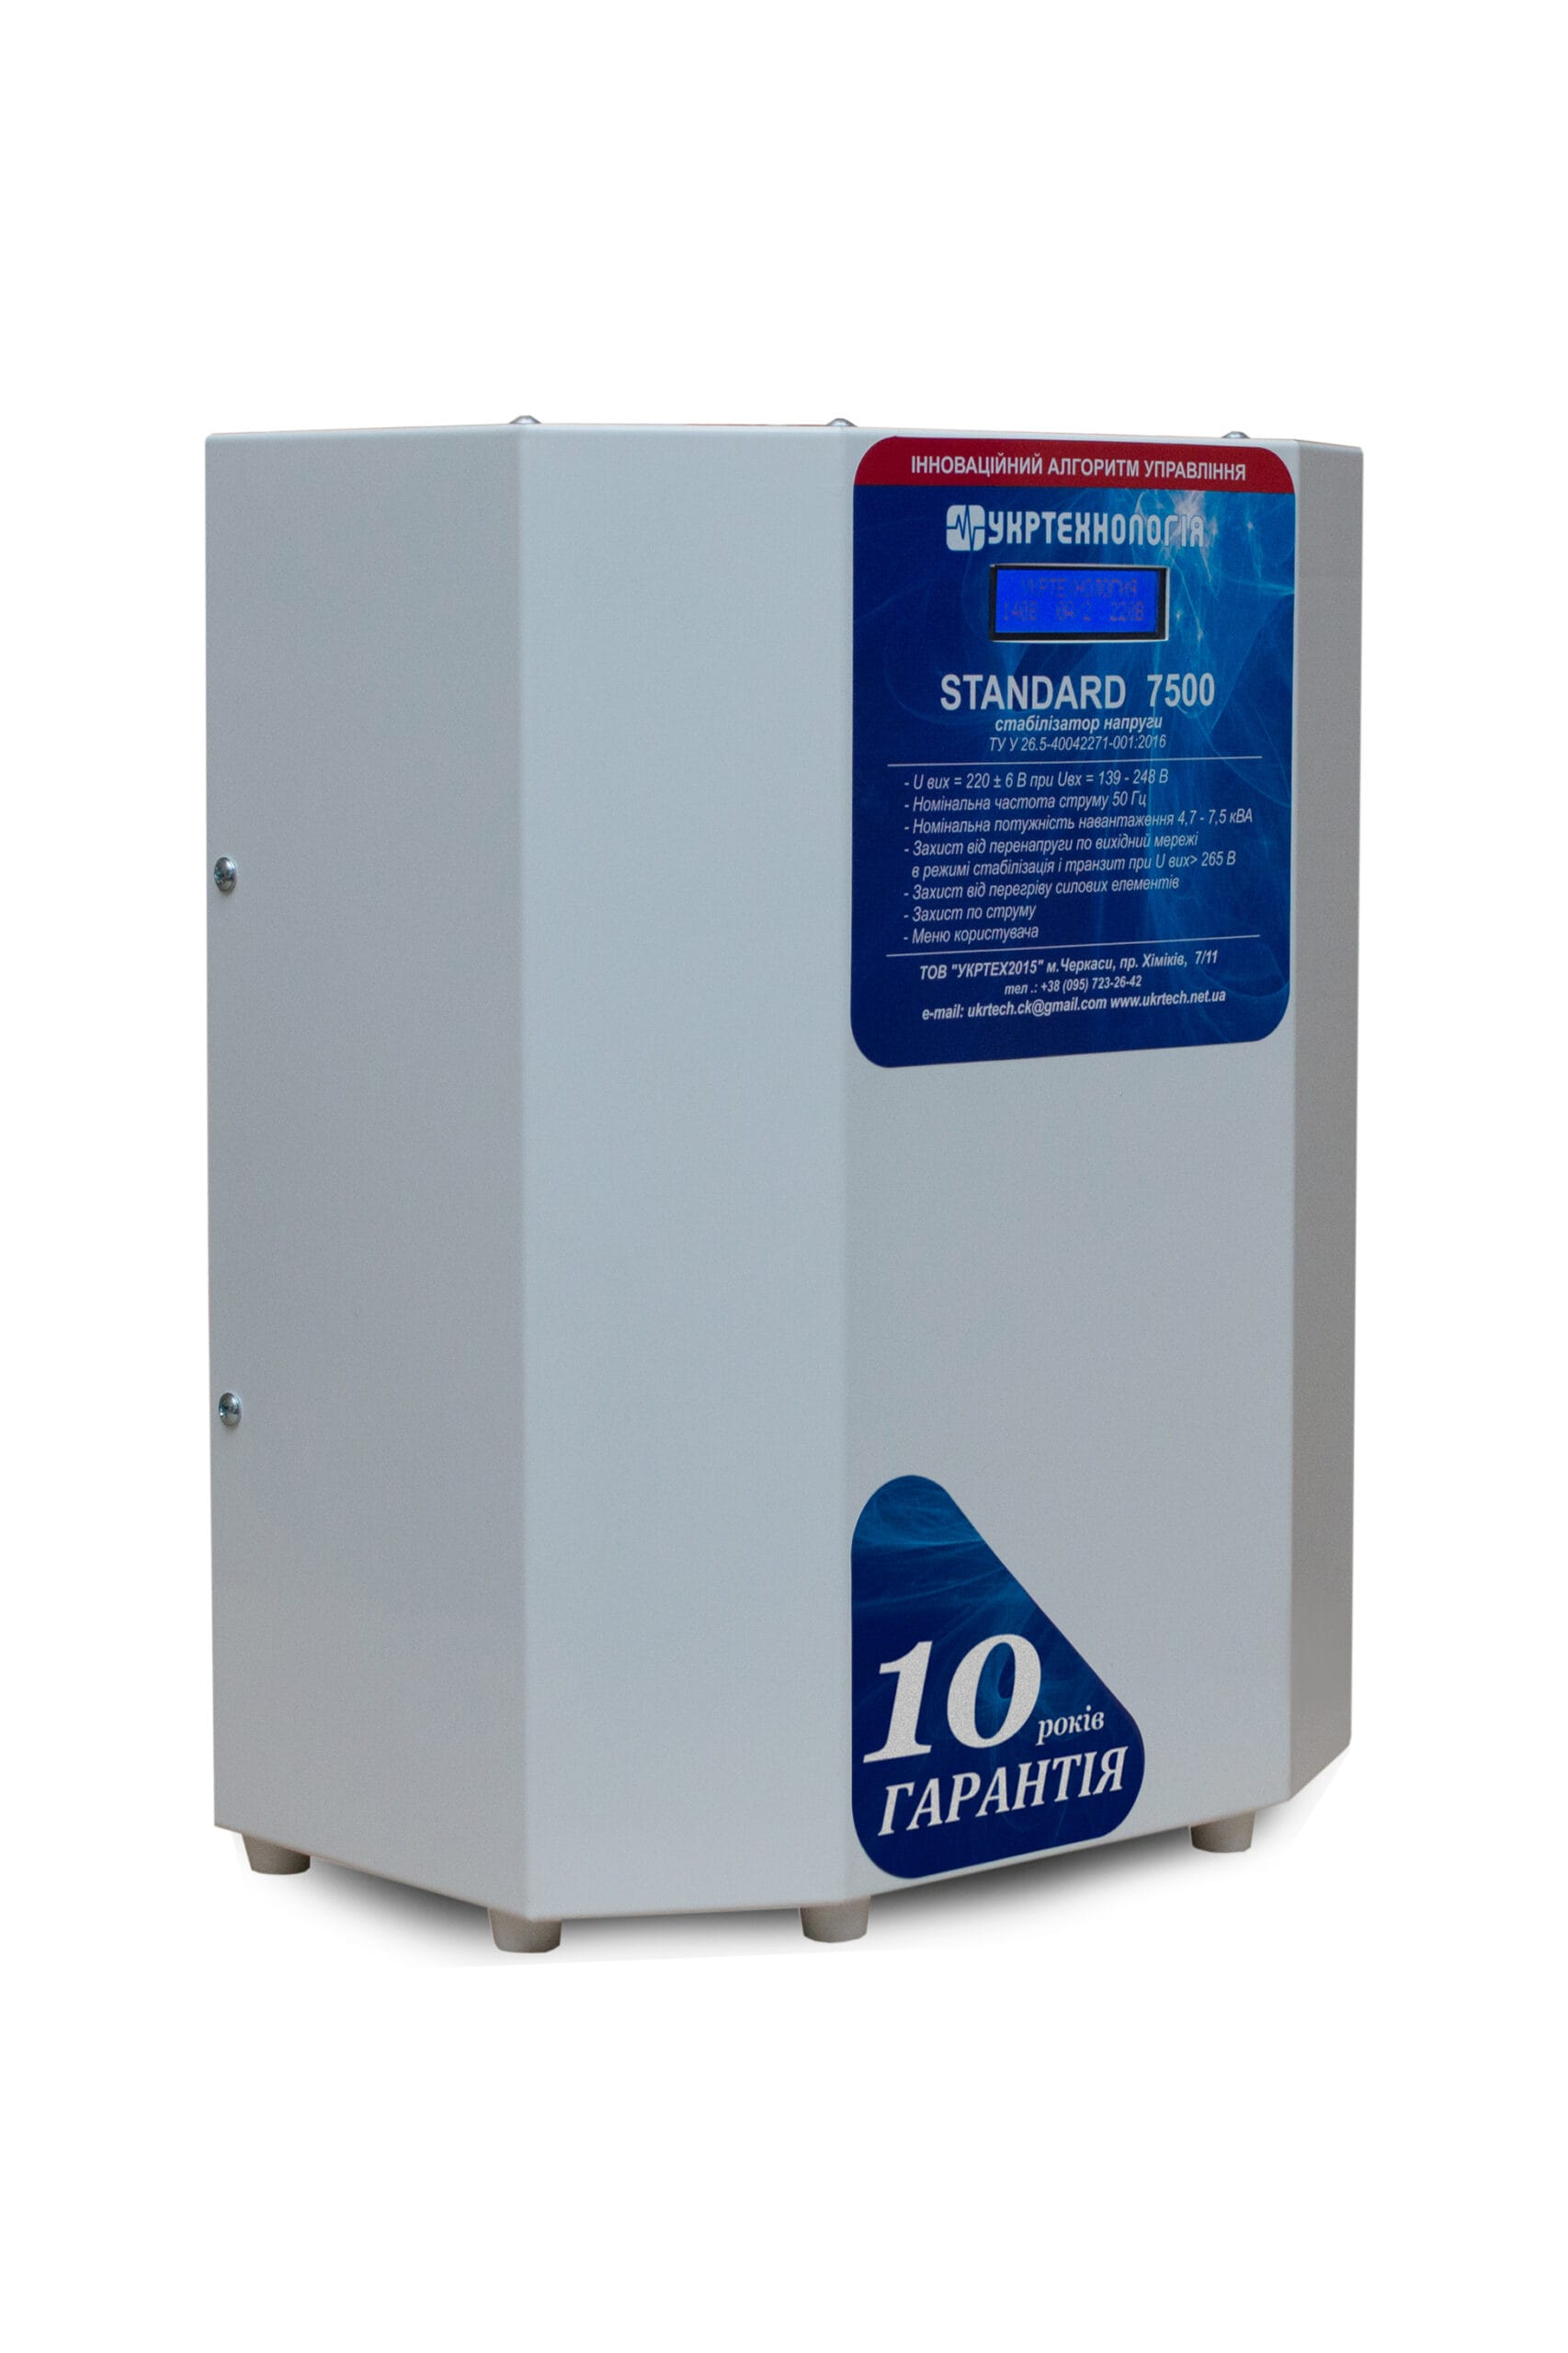 Стабилизаторы напряжения - Стабилизатор напряжения 7,5 кВт STANDARD 000001397 - Фото 2